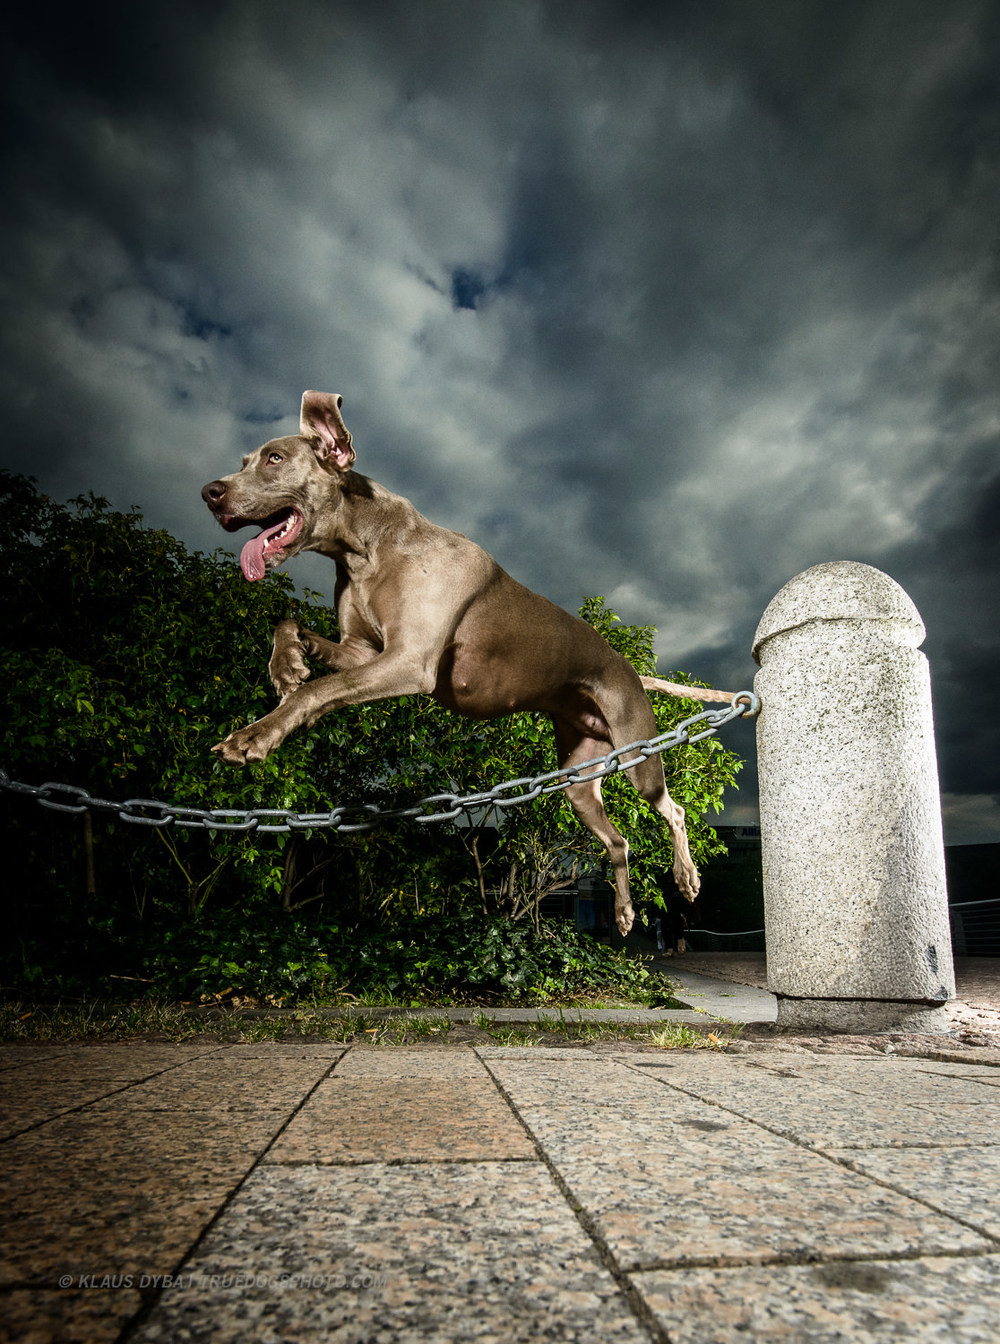 tdp-street dog agility-3.jpg